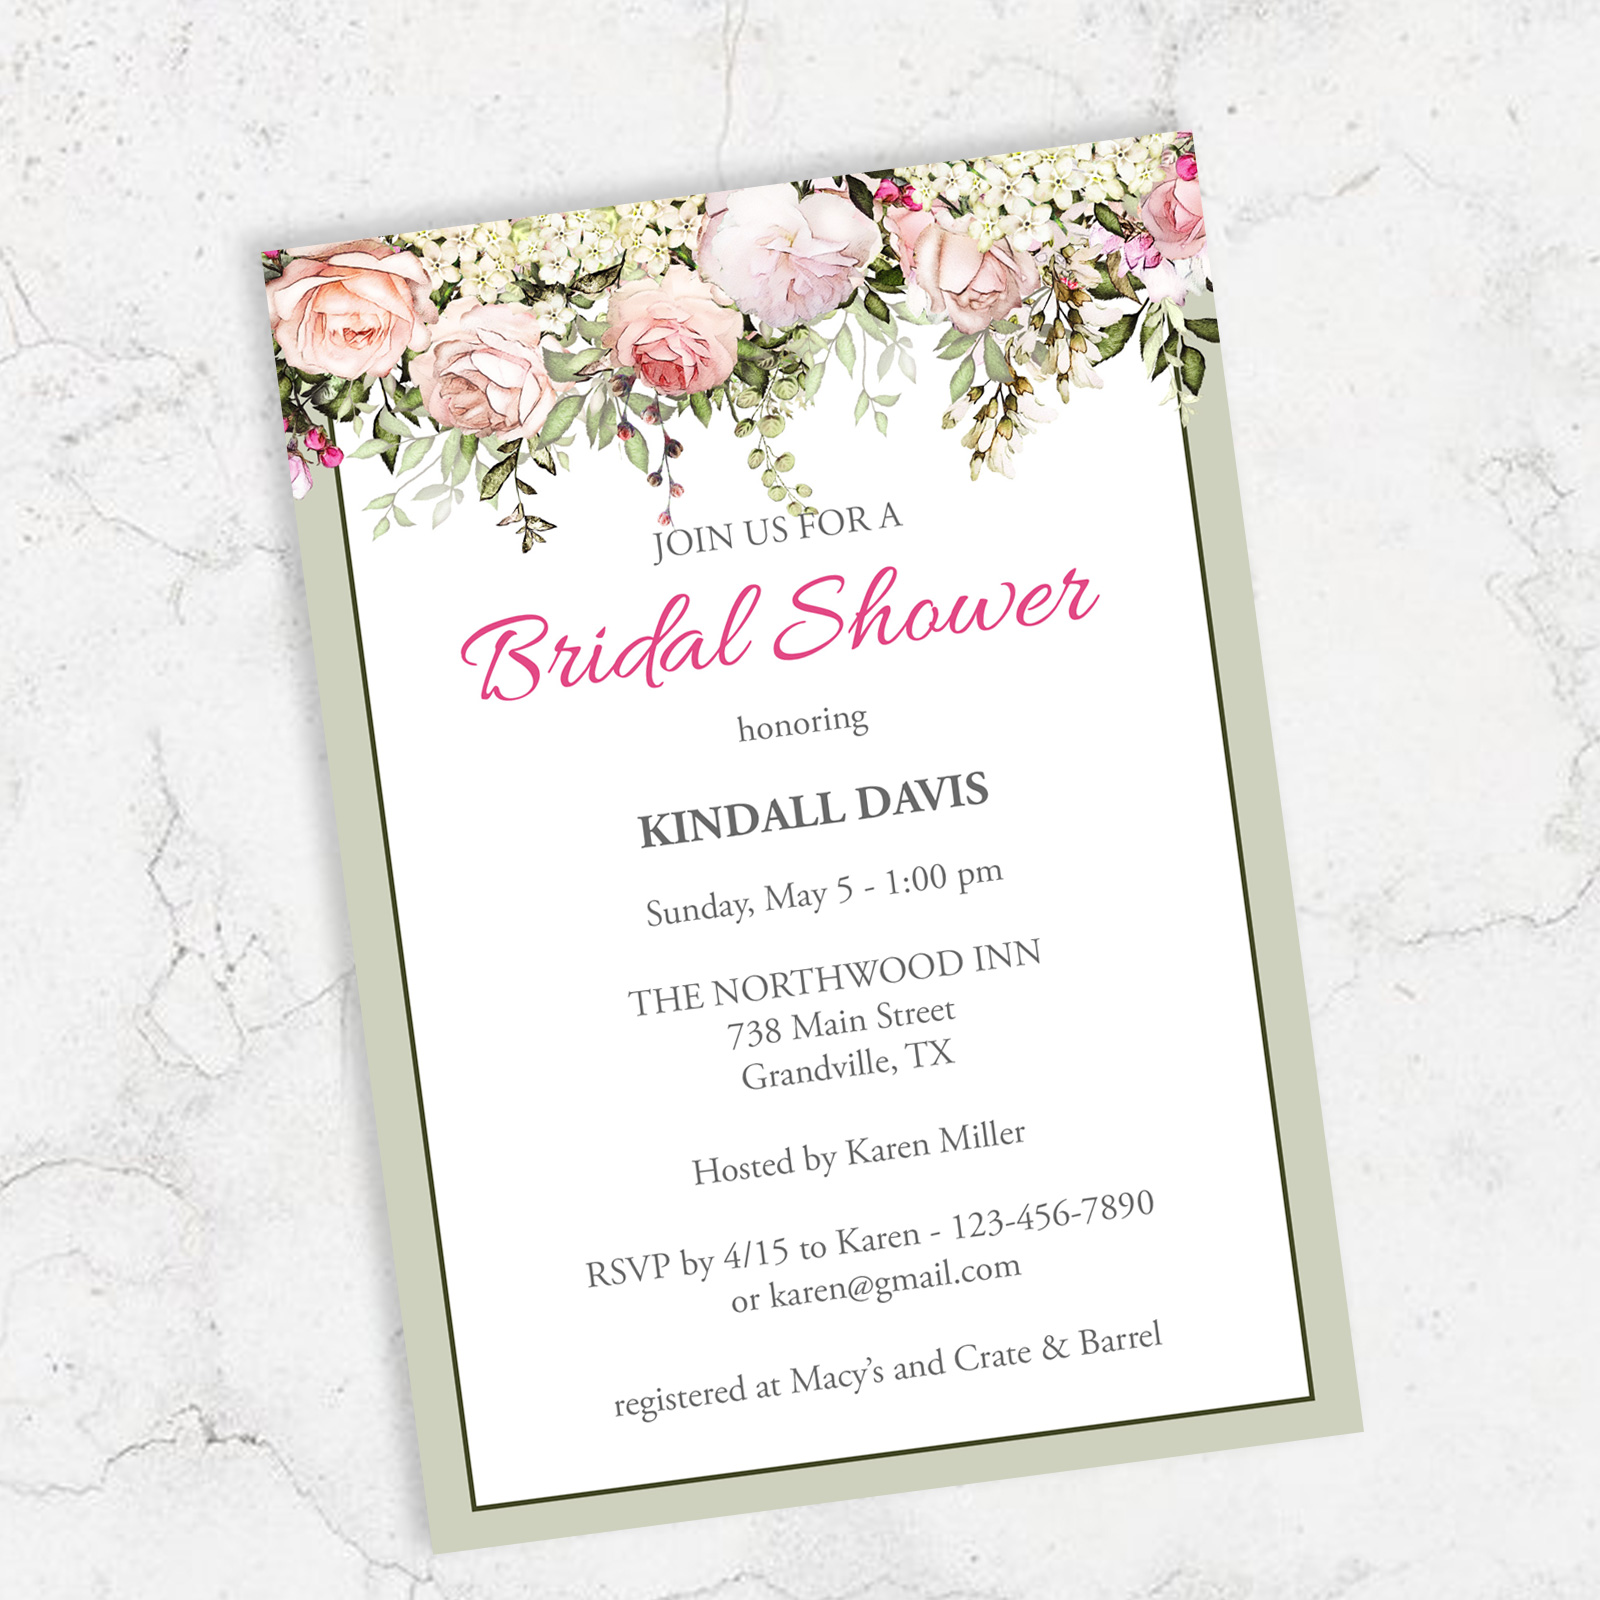 Bridal Shower Invitation Template Rose Garden Theme